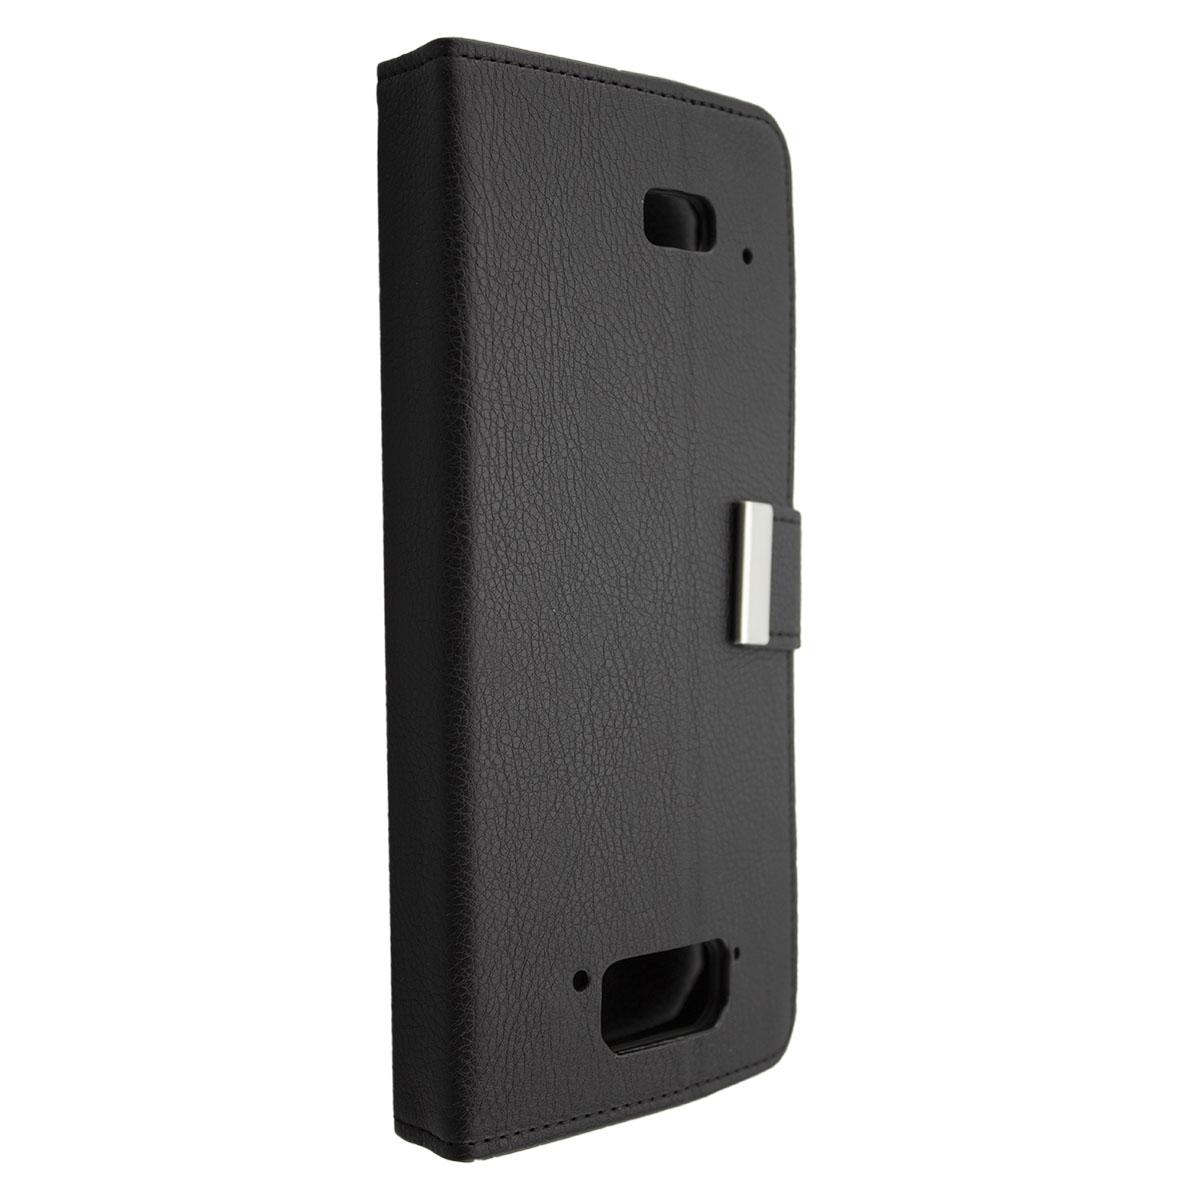 caseroxx-Bookstyle-Case-for-Blackview-BV9500-BV9500-Pro-BV9500-Plus-made-of thumbnail 5